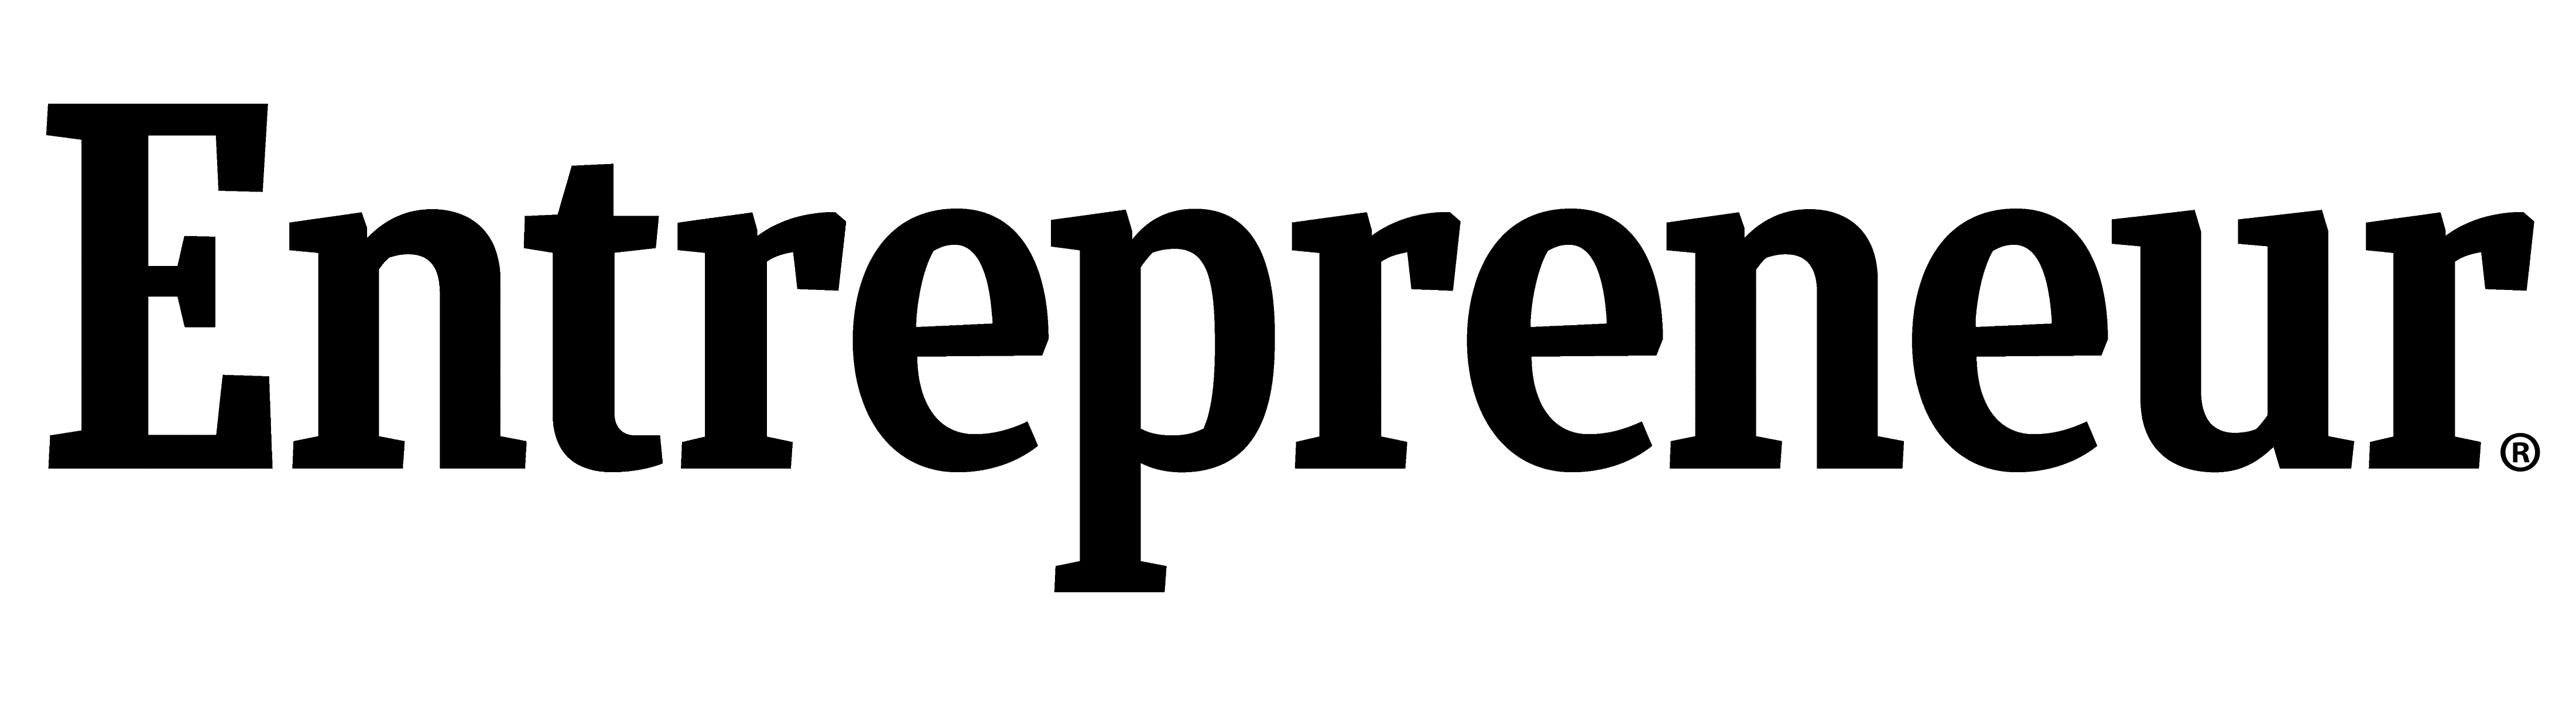 5f09b665ffa57d5b6a350359_entrepreneur-logo